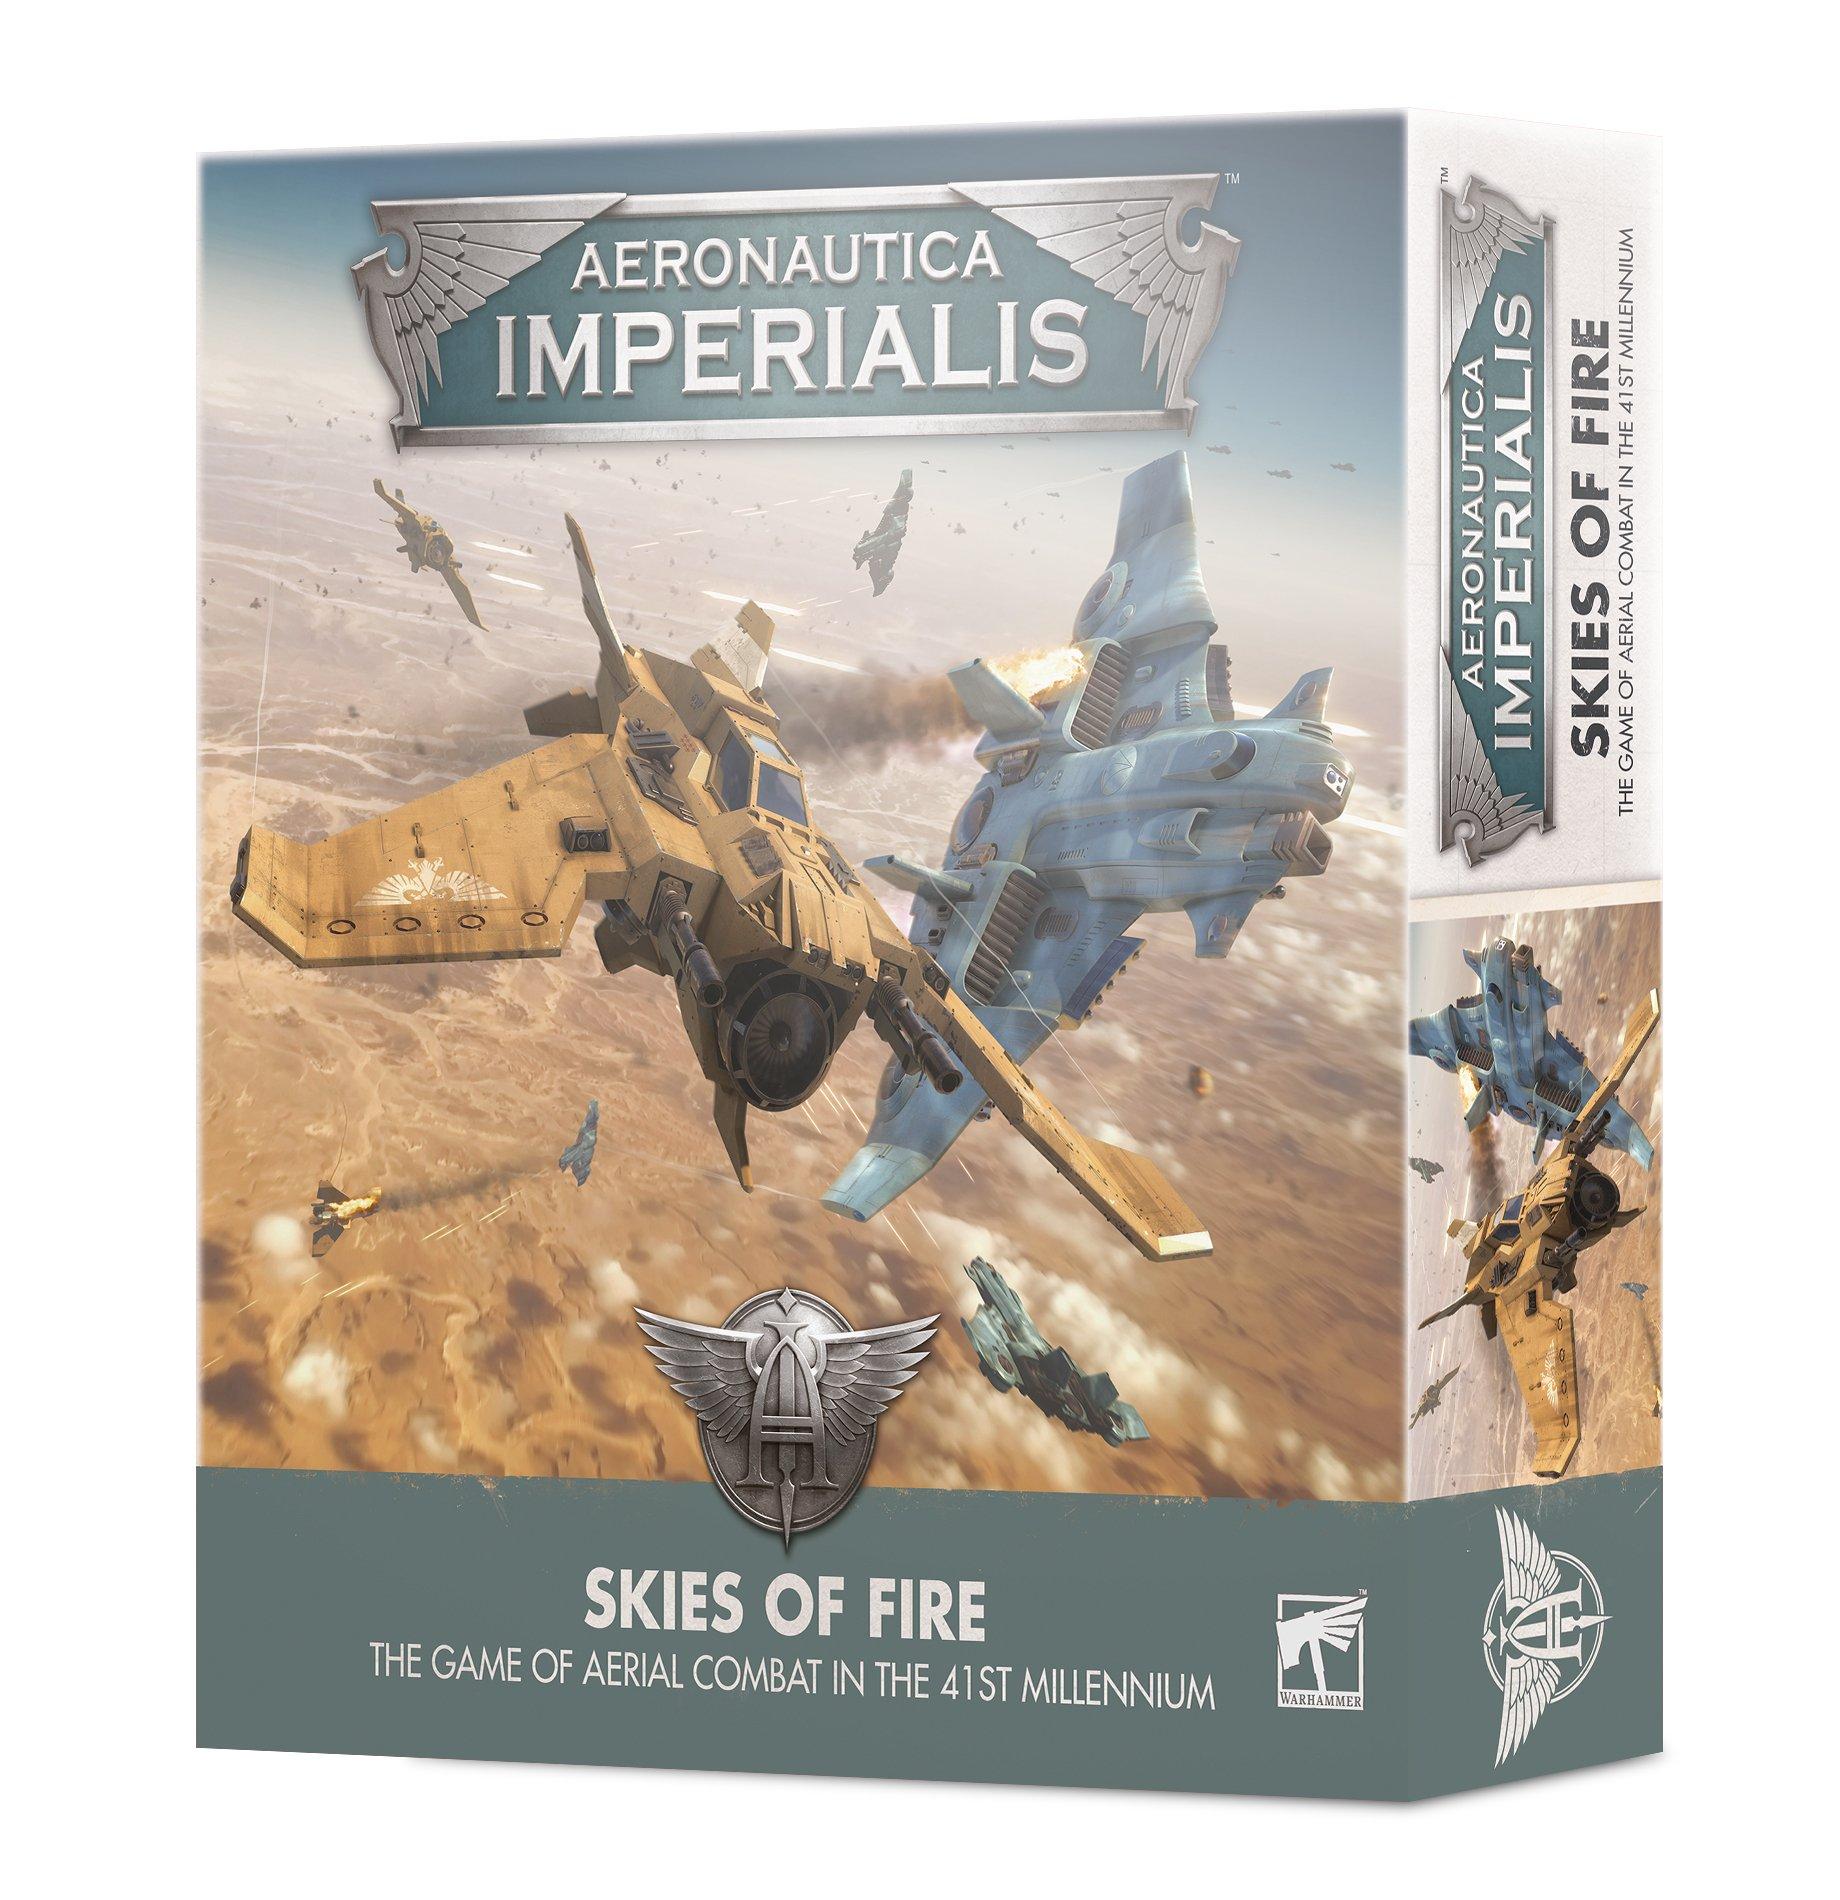 Skies of Fire, Aeronautica Imperialis